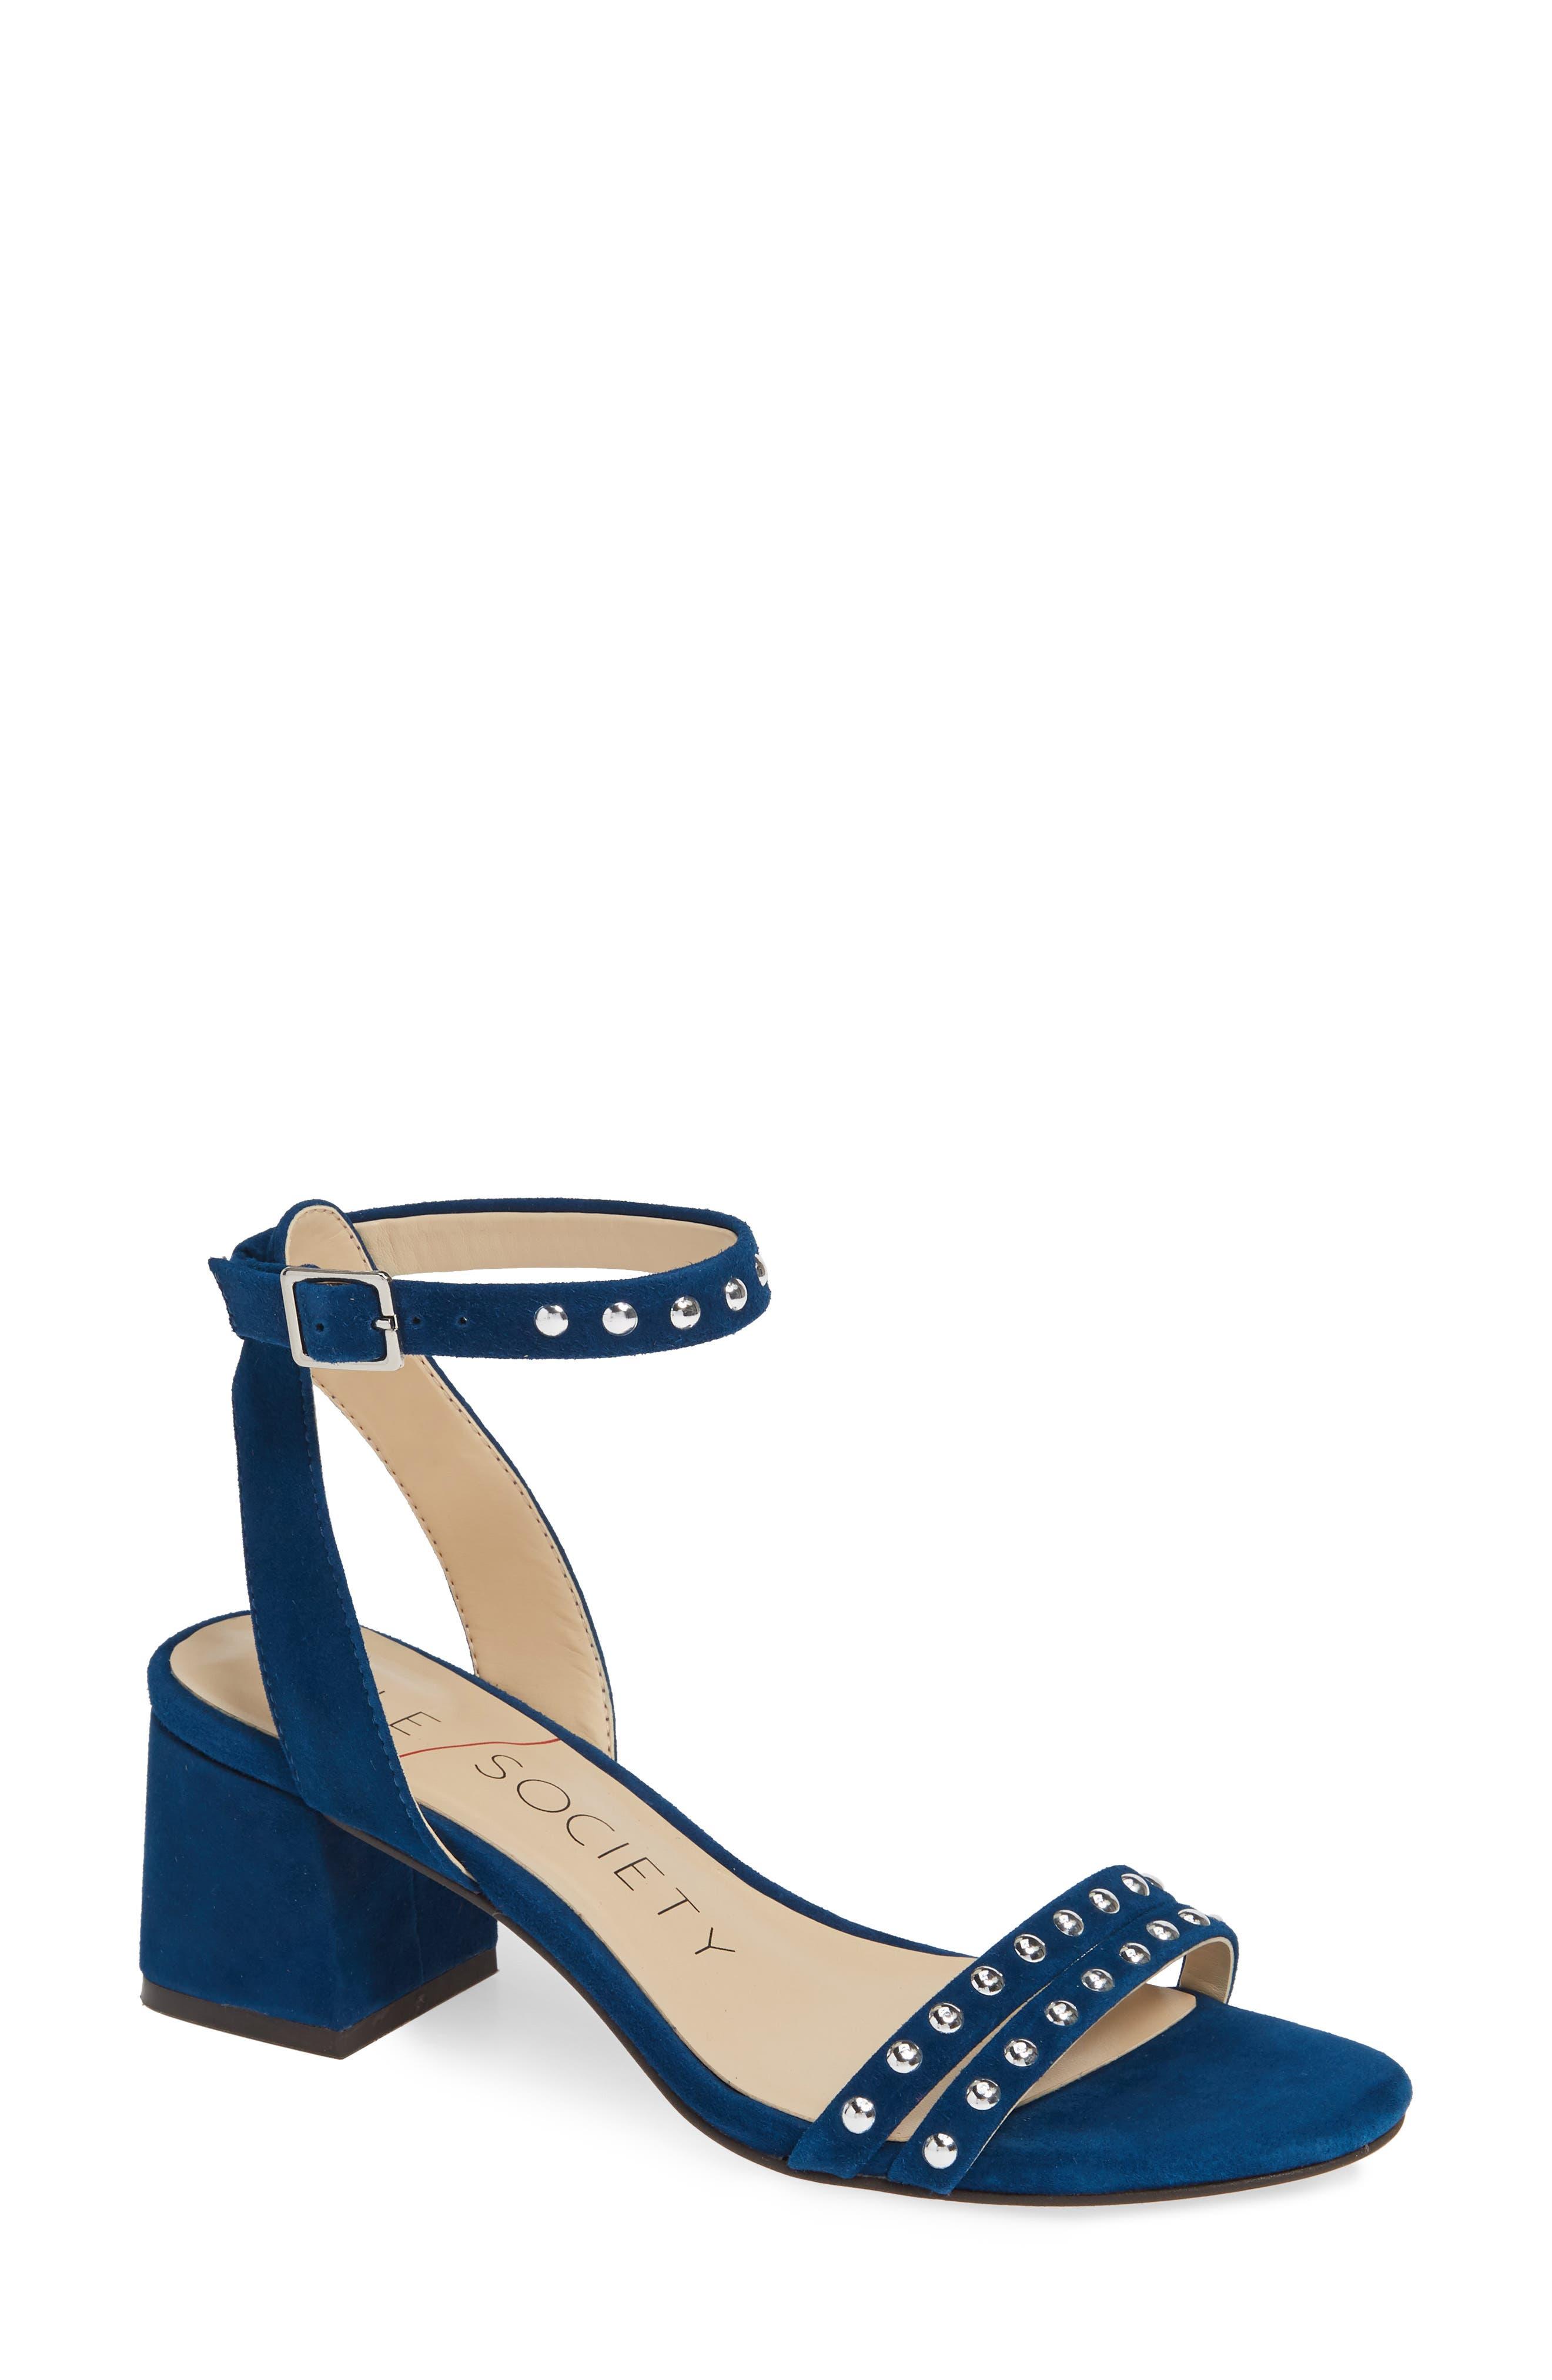 Hezzter Studded Sandal, Main, color, CERULEAN BLUE SUEDE